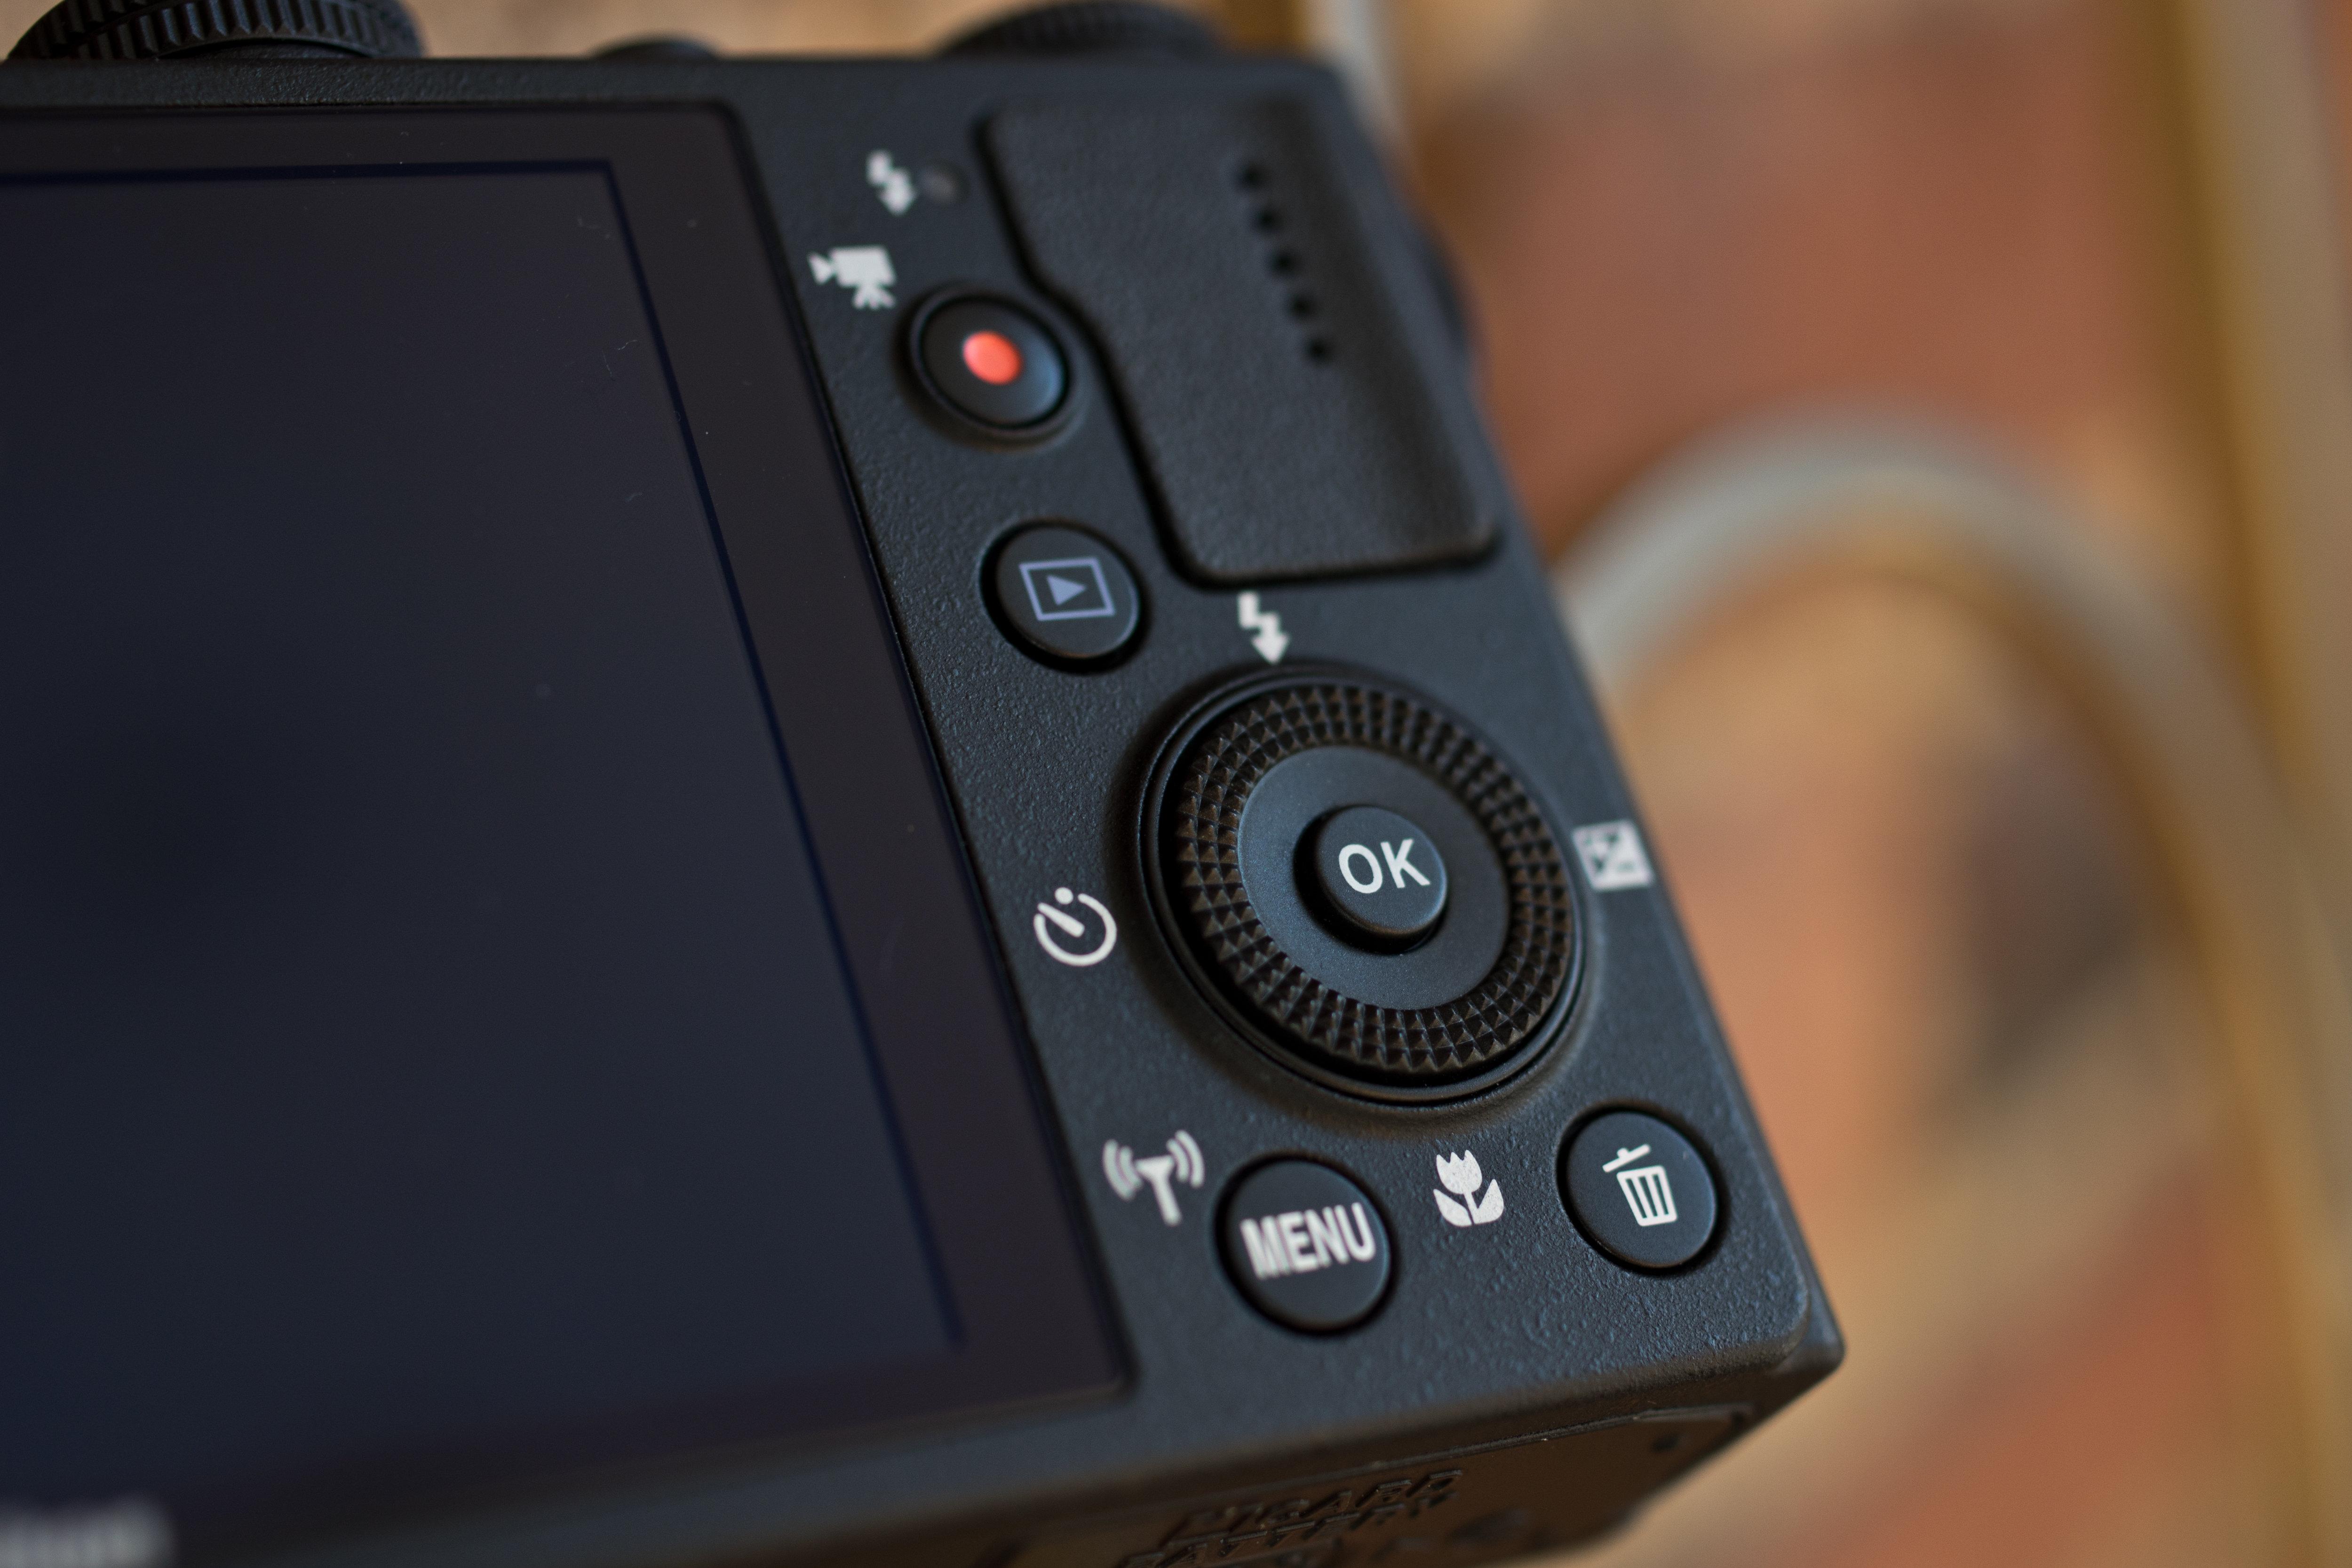 A photograph of the Nikon Coolpix P340's rear controls.